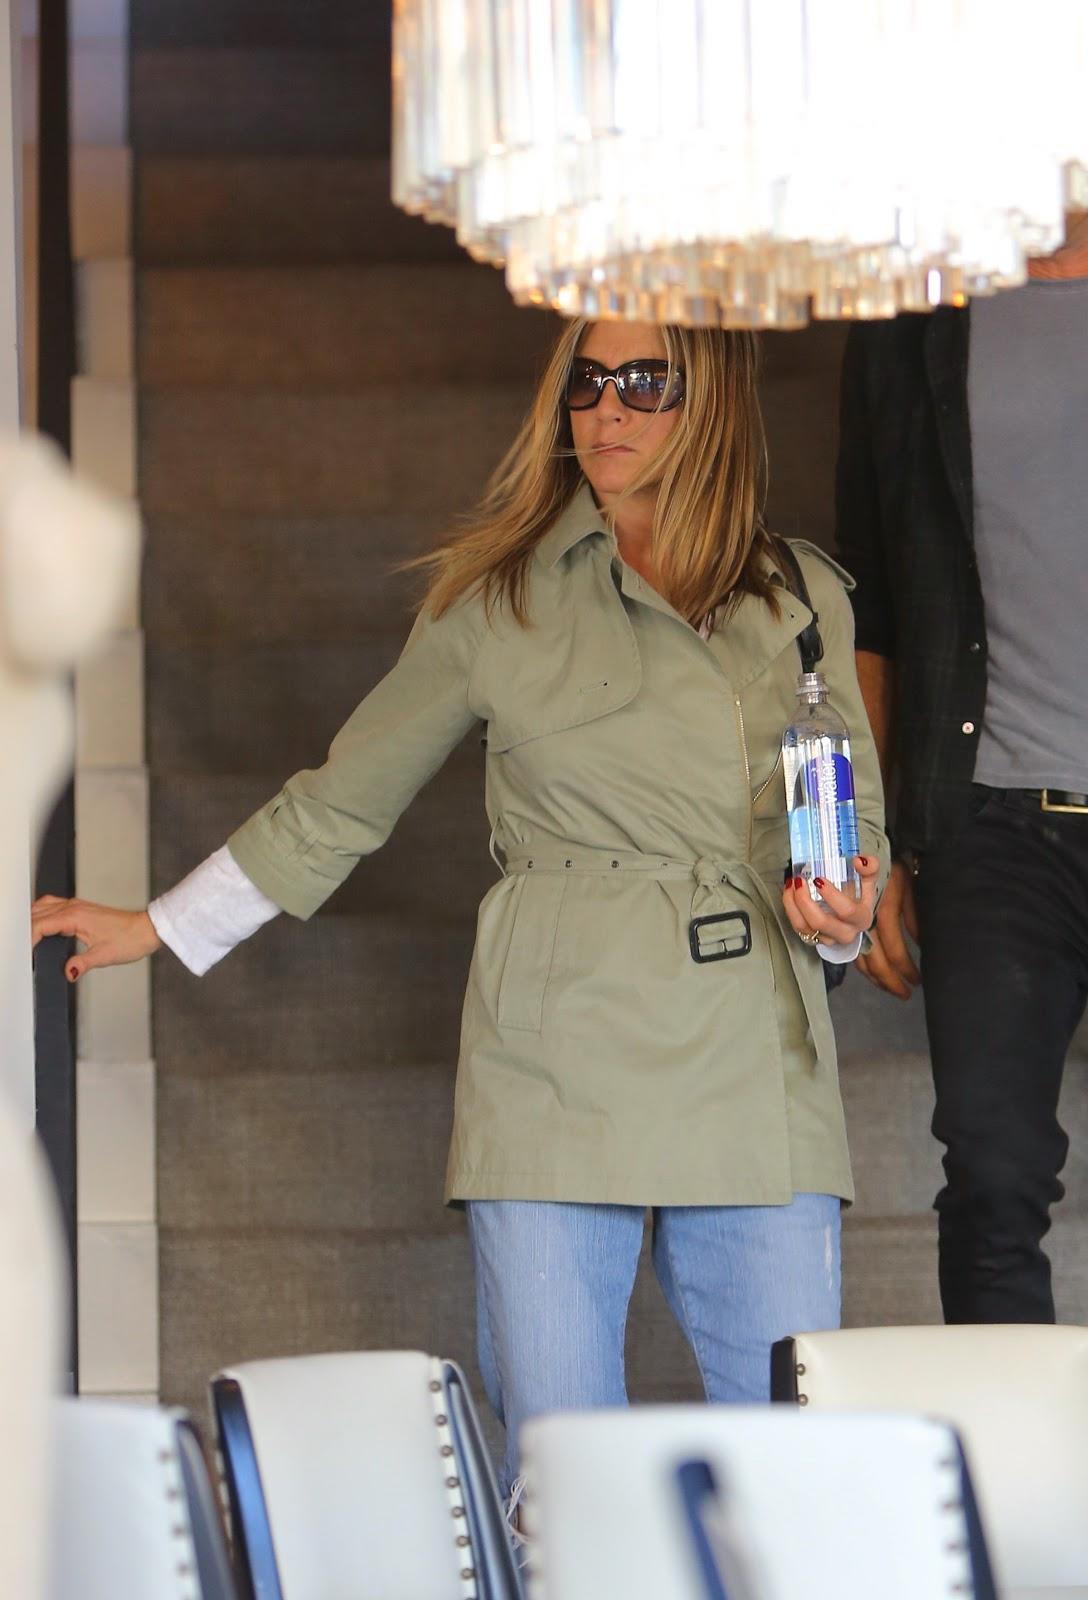 http://3.bp.blogspot.com/-h9hKeQ4TBXU/UJCTCDLzOCI/AAAAAAAAXfw/QiZxyhrjacs/s1600/Jennifer+Aniston+spotted+at+furniture+stores+in+Hollywood,+October+29,+2012.jpg